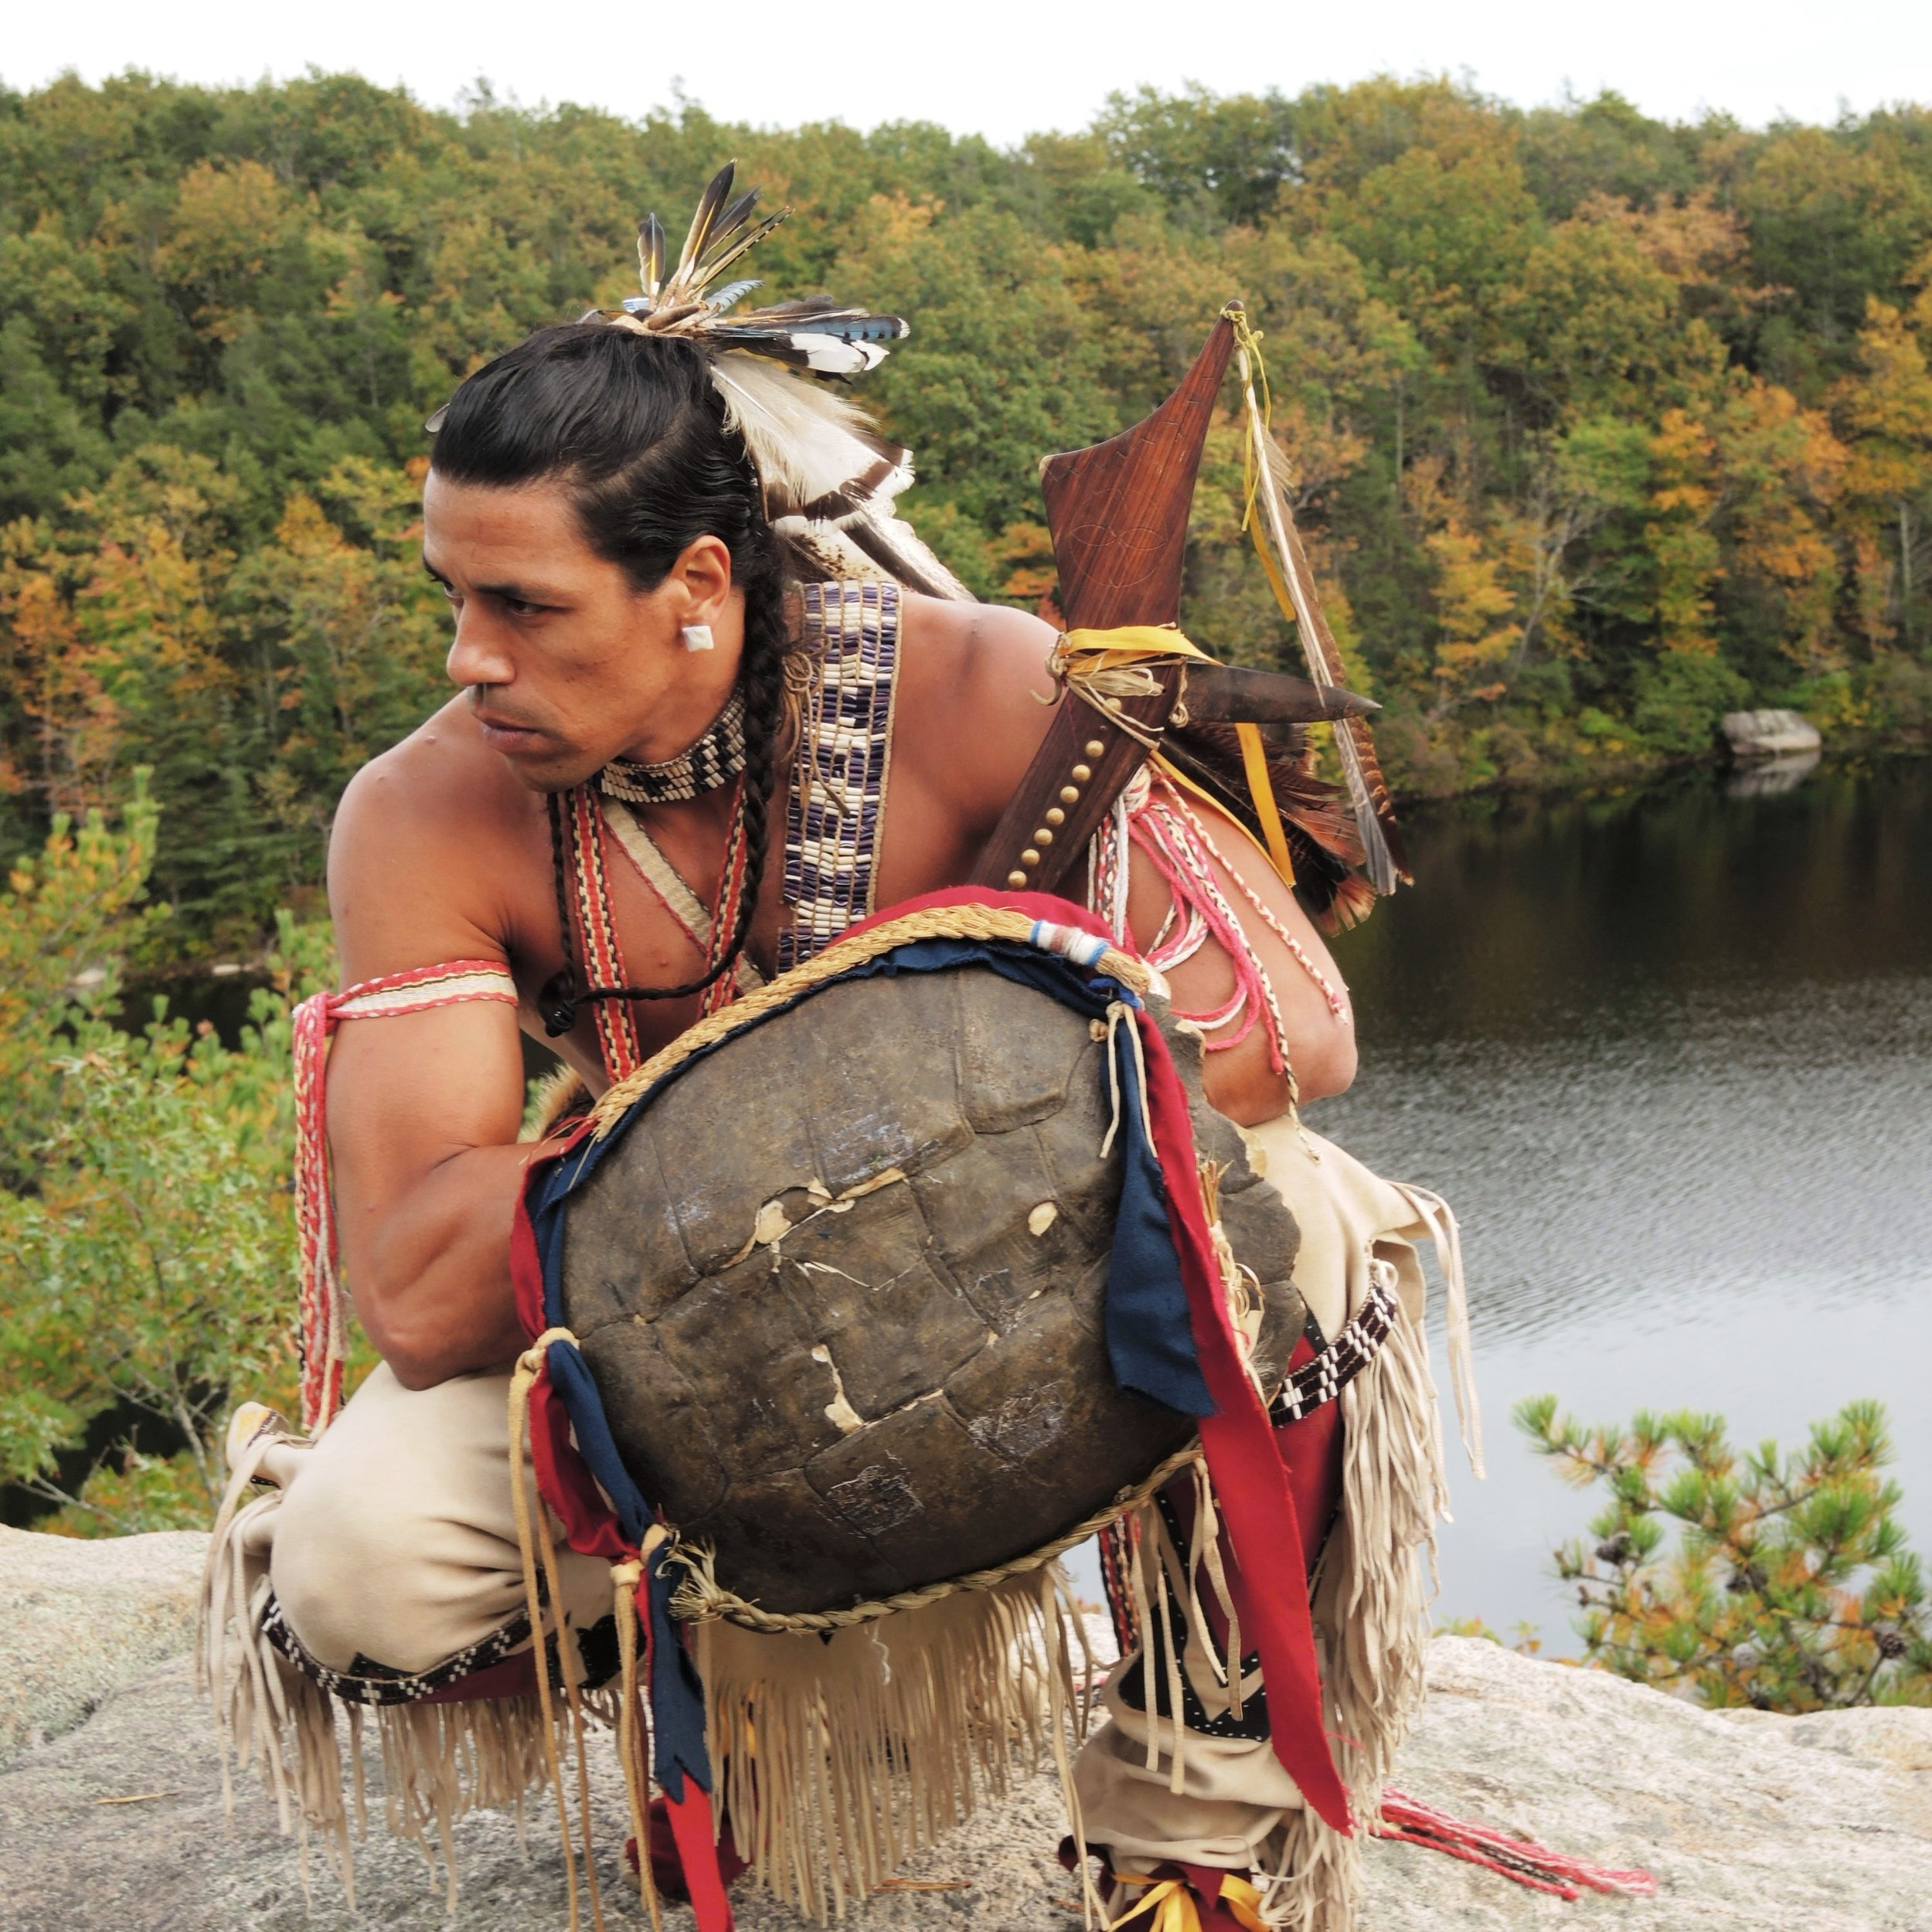 Annawon Weeden/ Mashpee Wampanoag/ Story Telling Performer